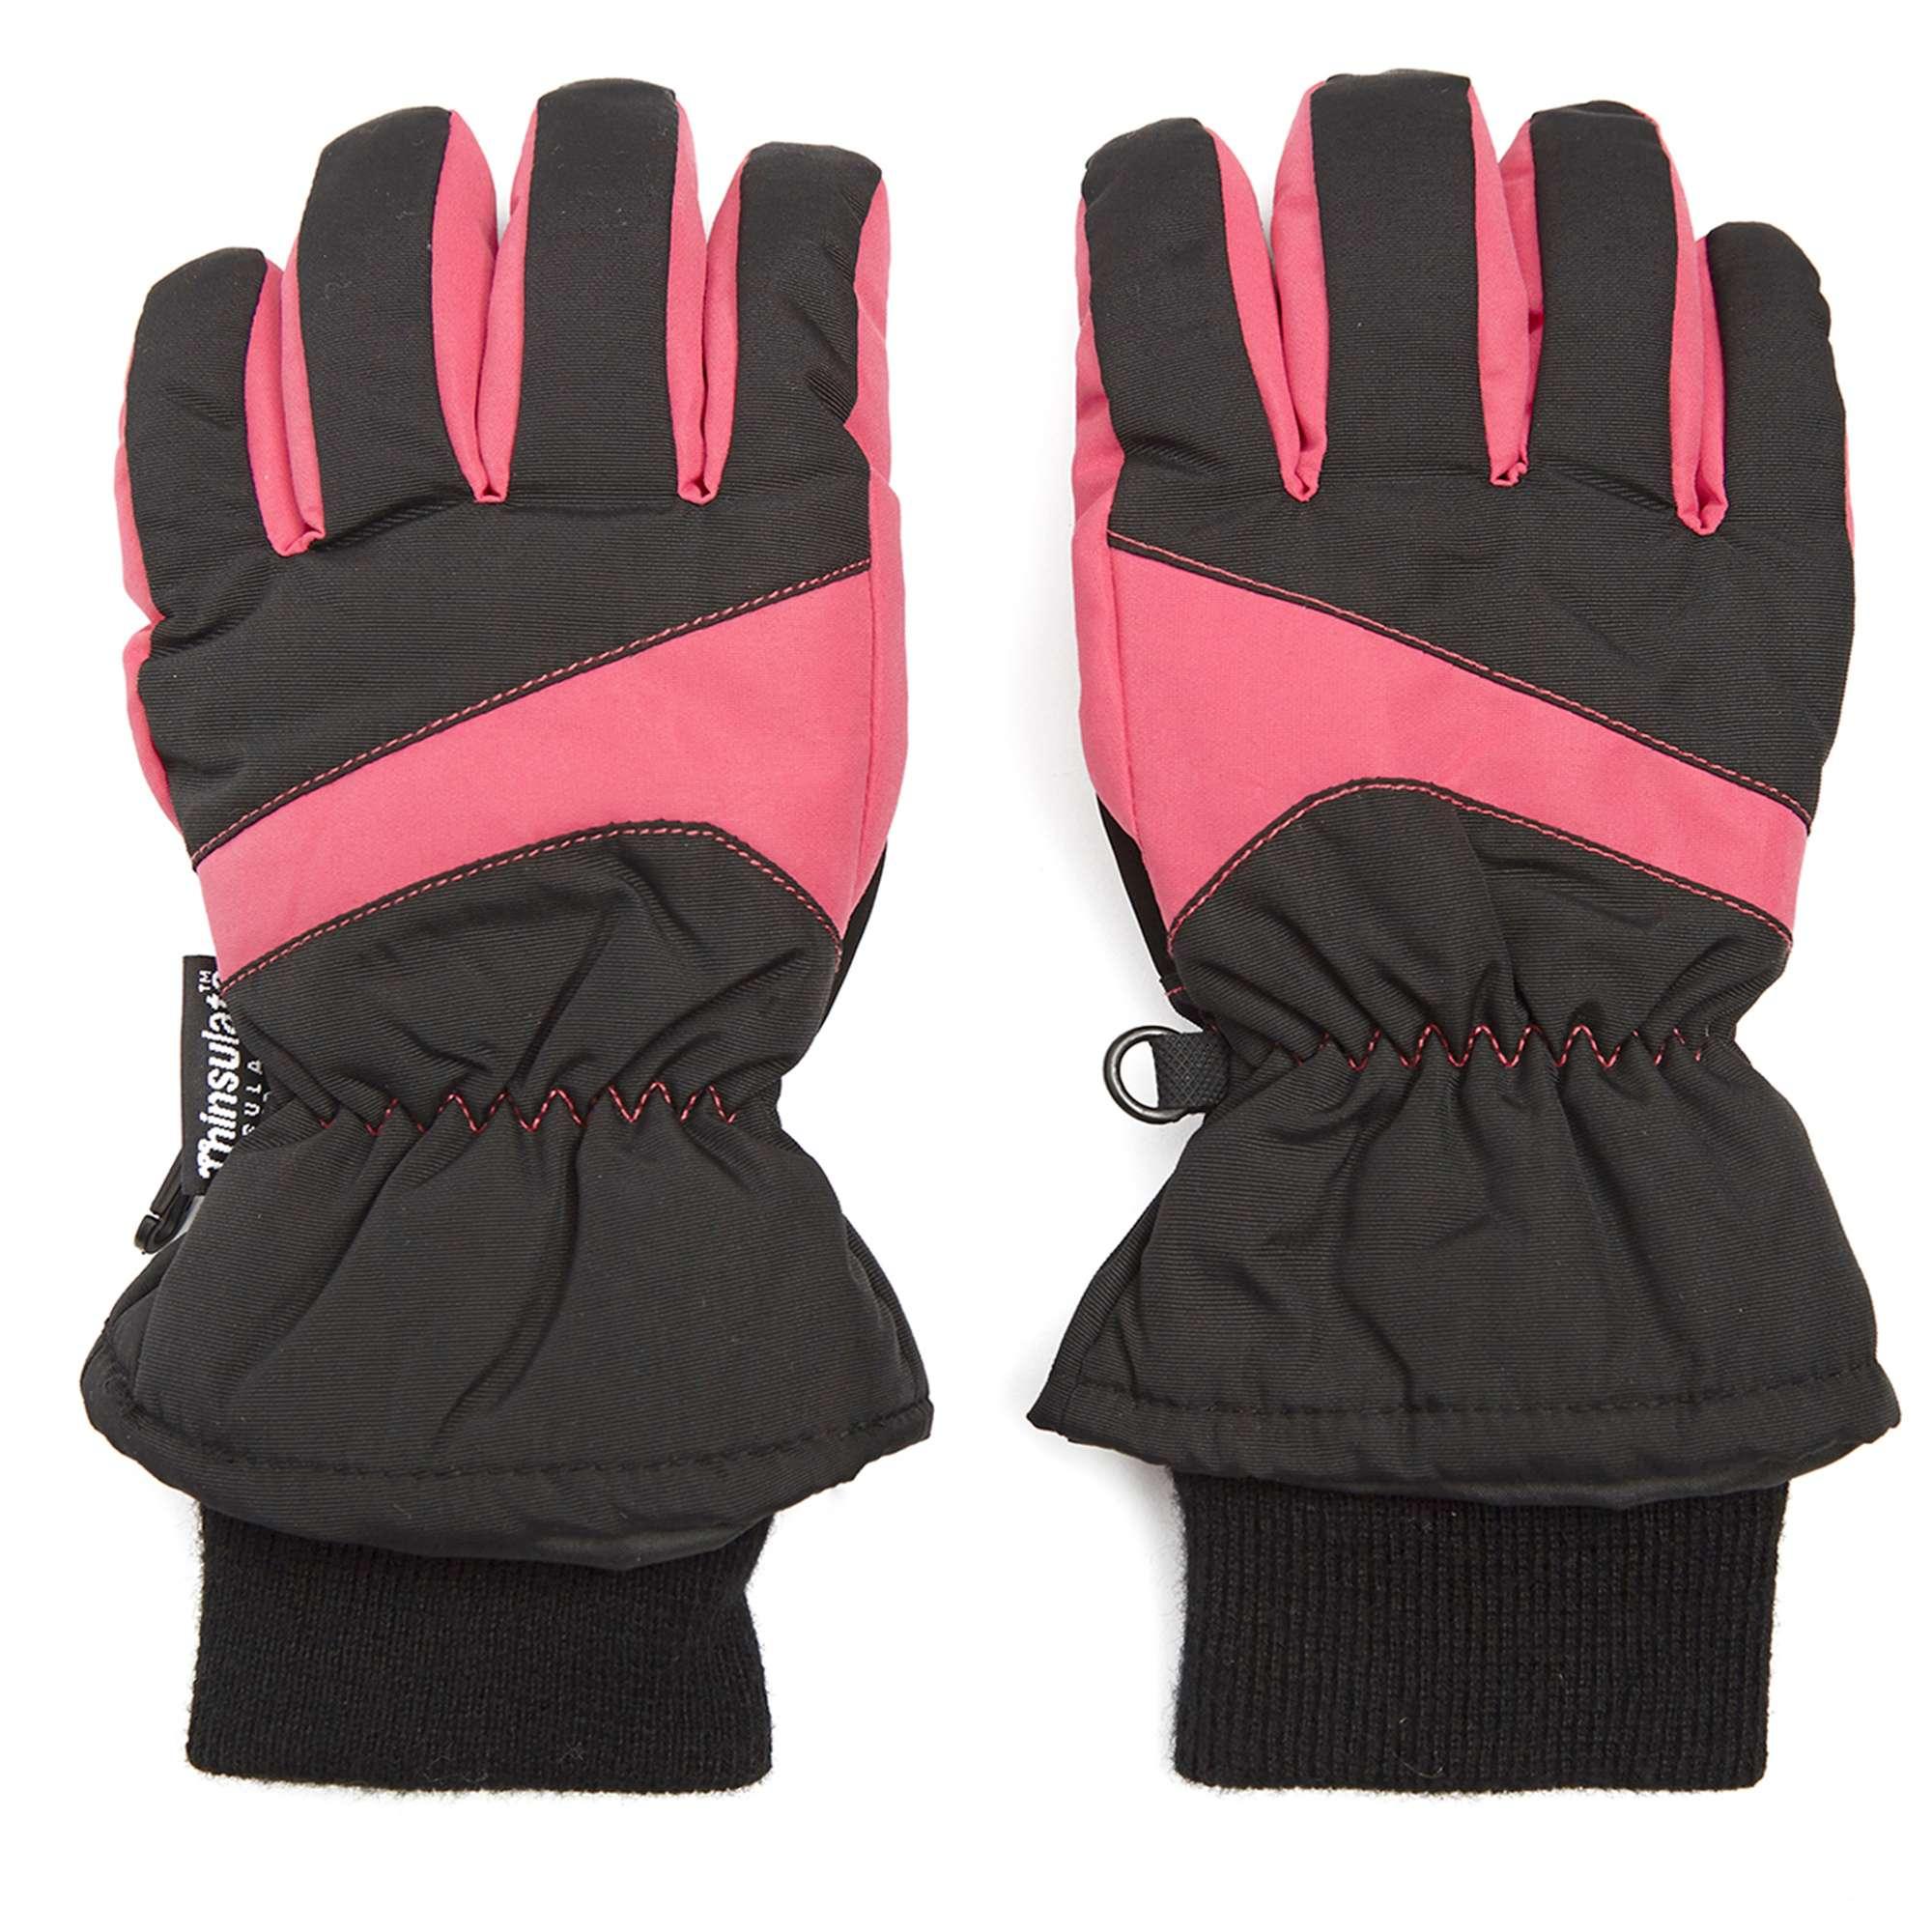 PETER STORM Girls' Ski Gloves